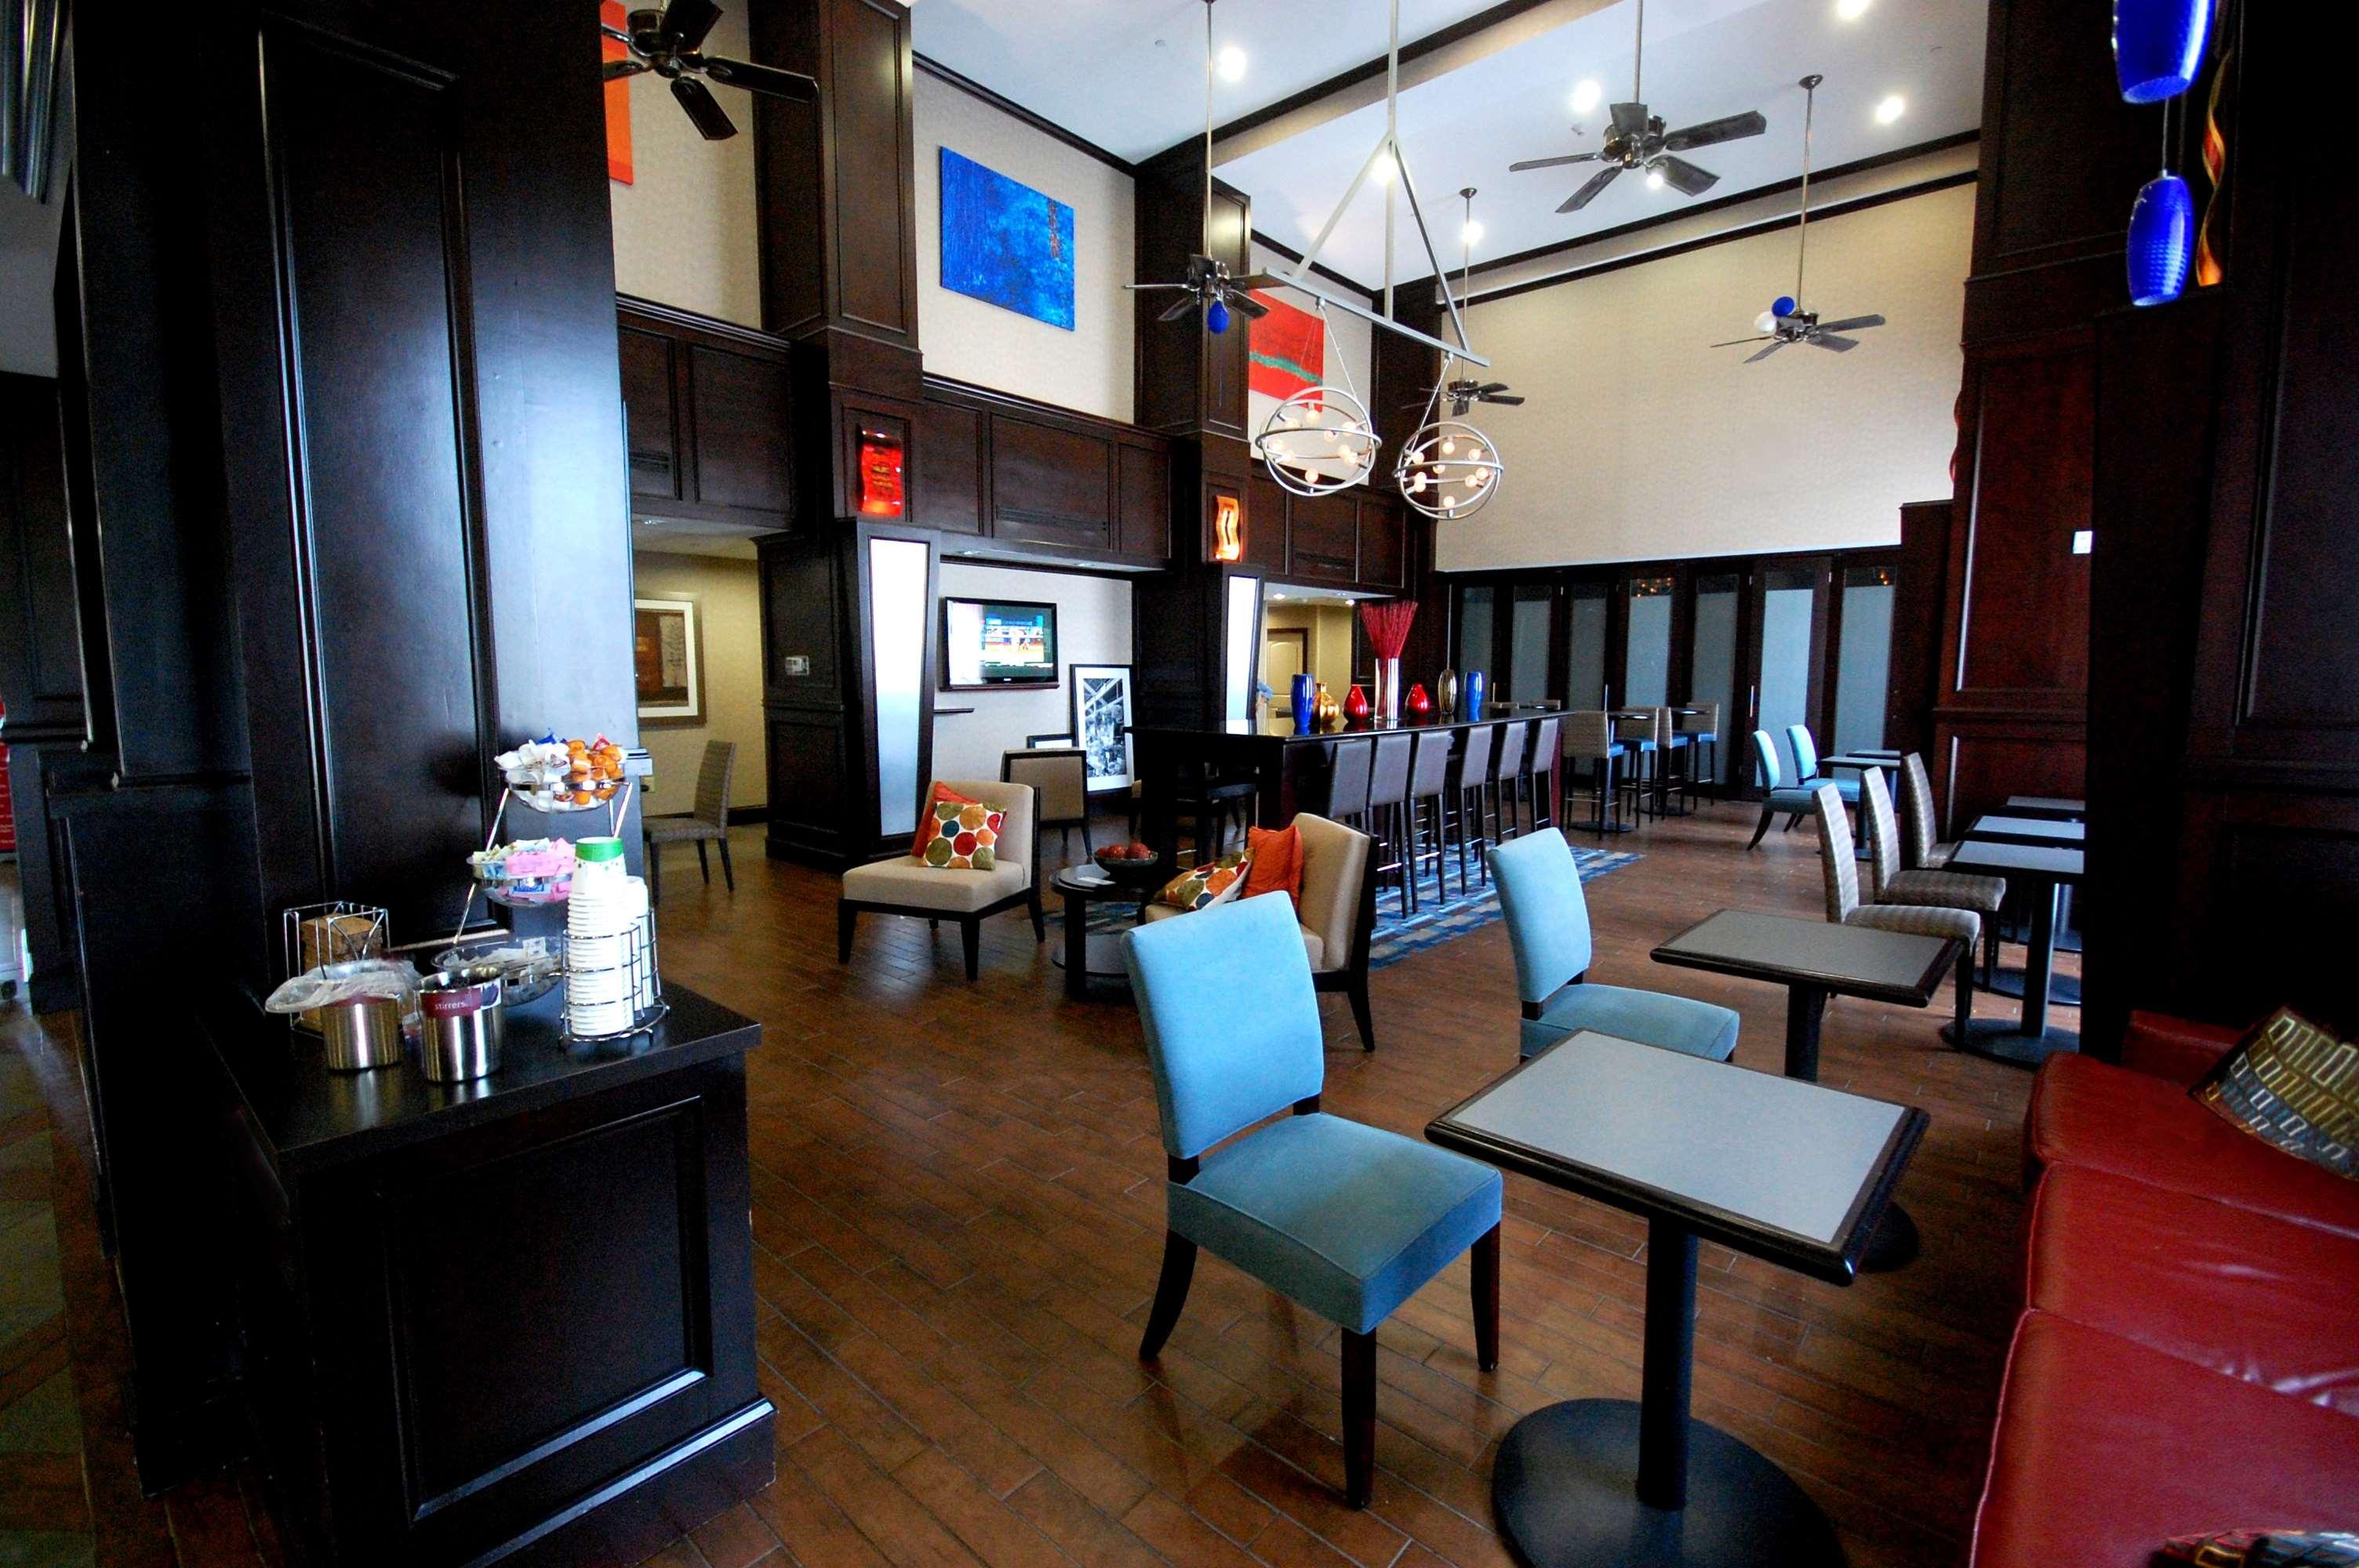 Hampton Inn & Suites Mount Pleasant image 8